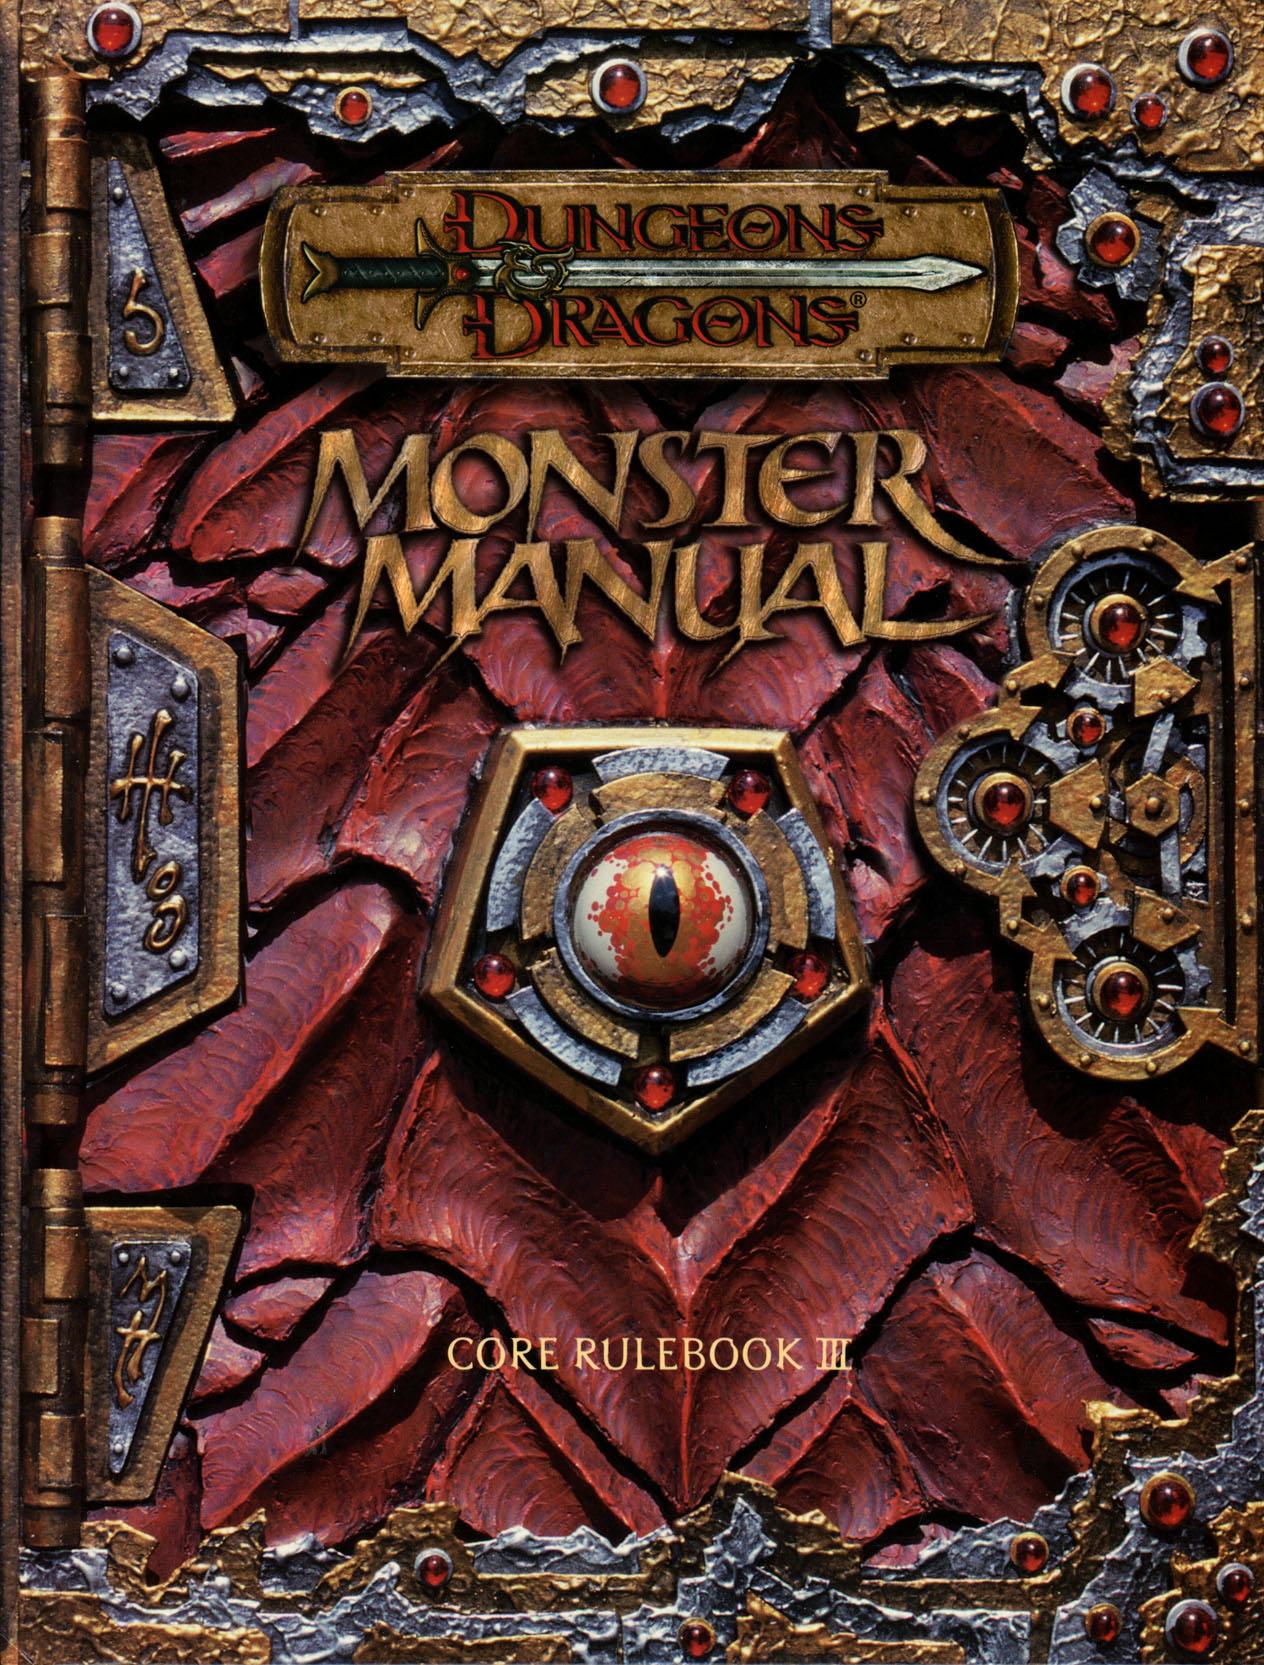 By skip williams monster manual: core rulebook iii v. 3. 5.